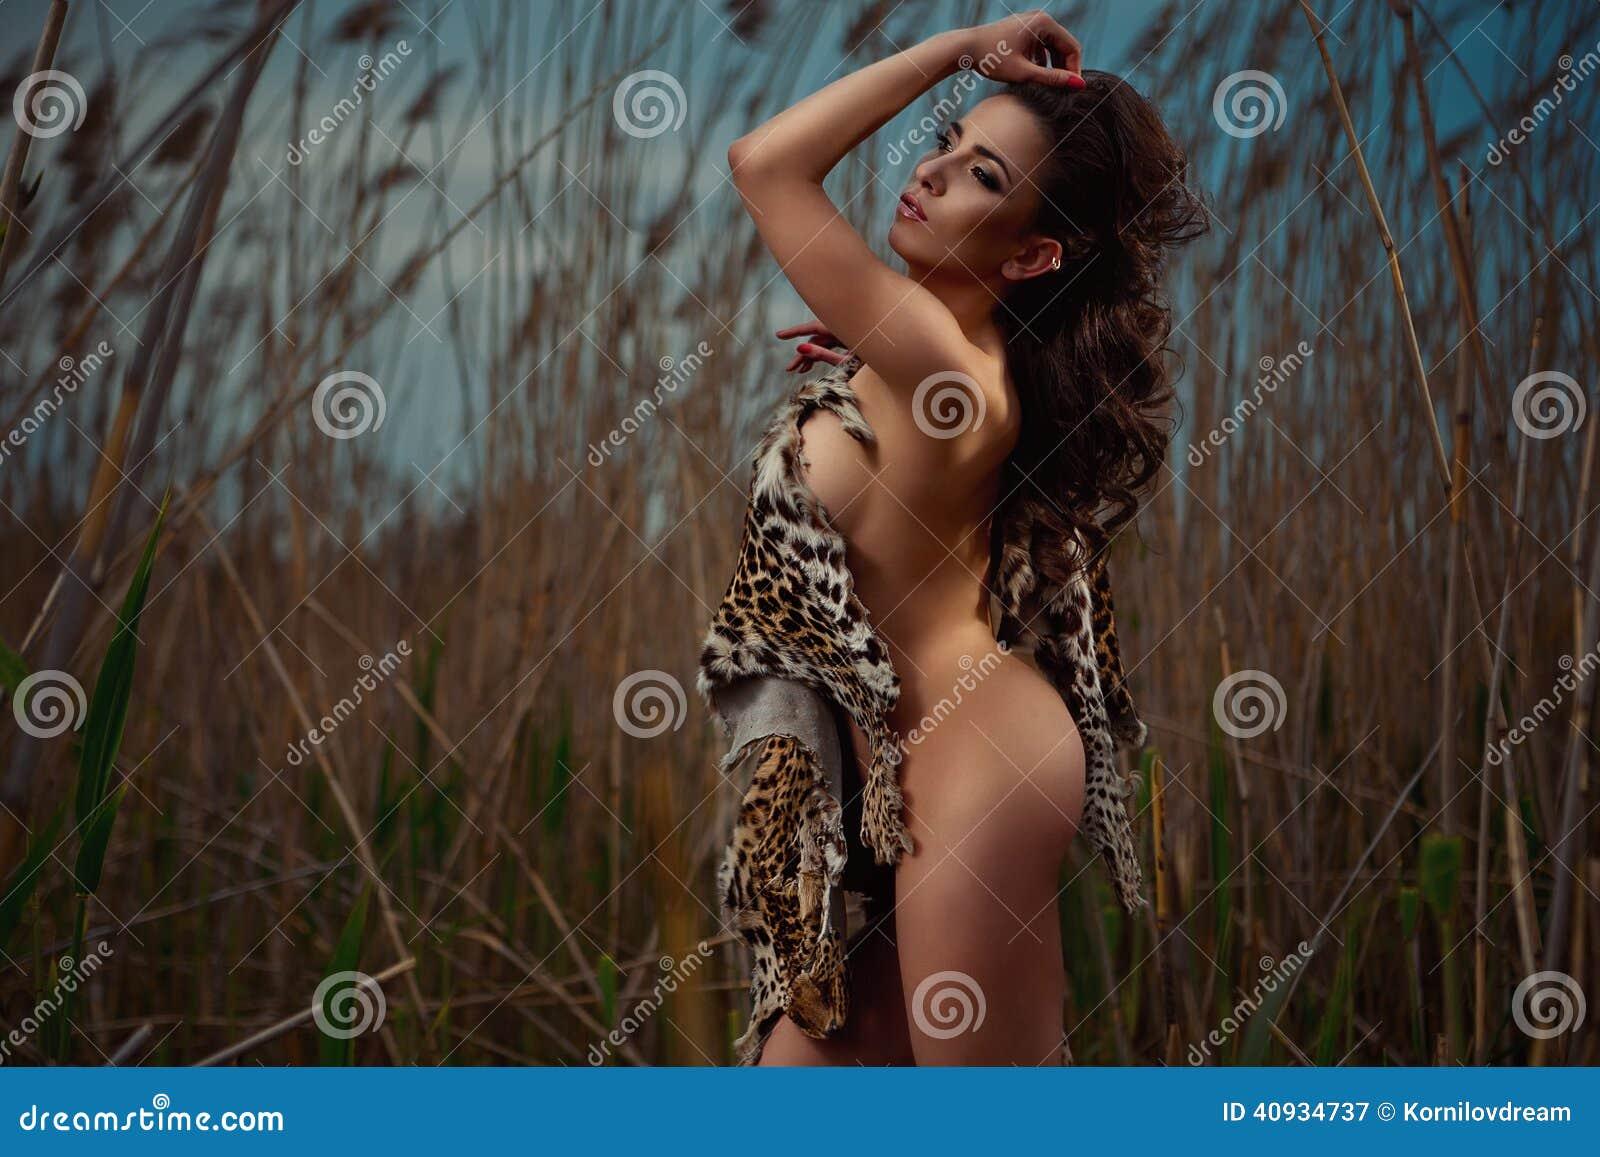 sexy Wild women